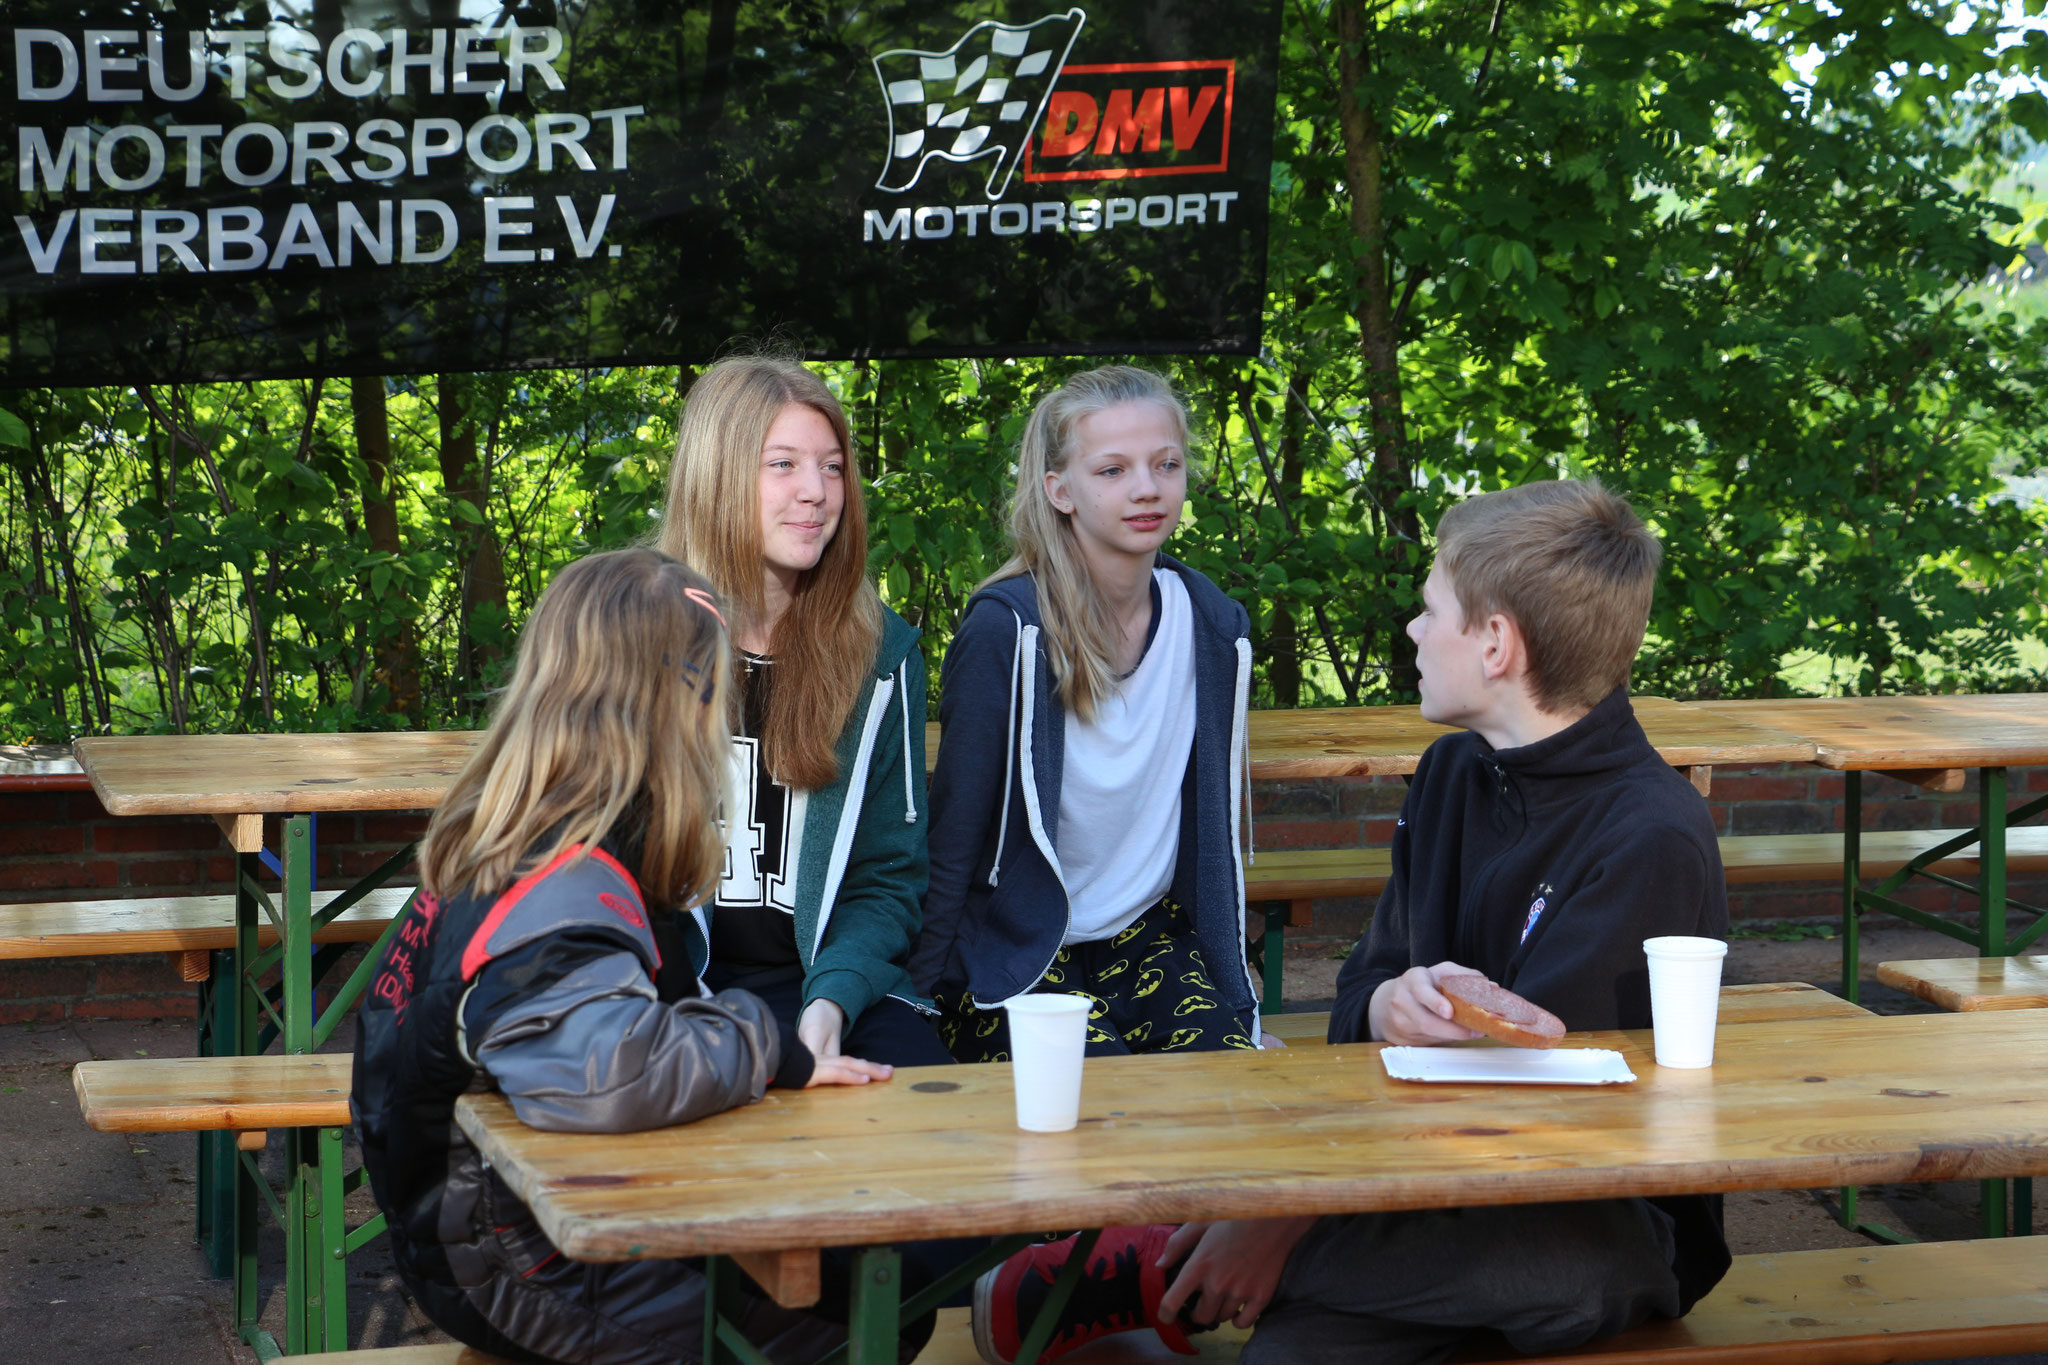 Lena Altmann, Janica Schlüer, Alicia Föge und Michel Boje (v. li.) am frühstücken